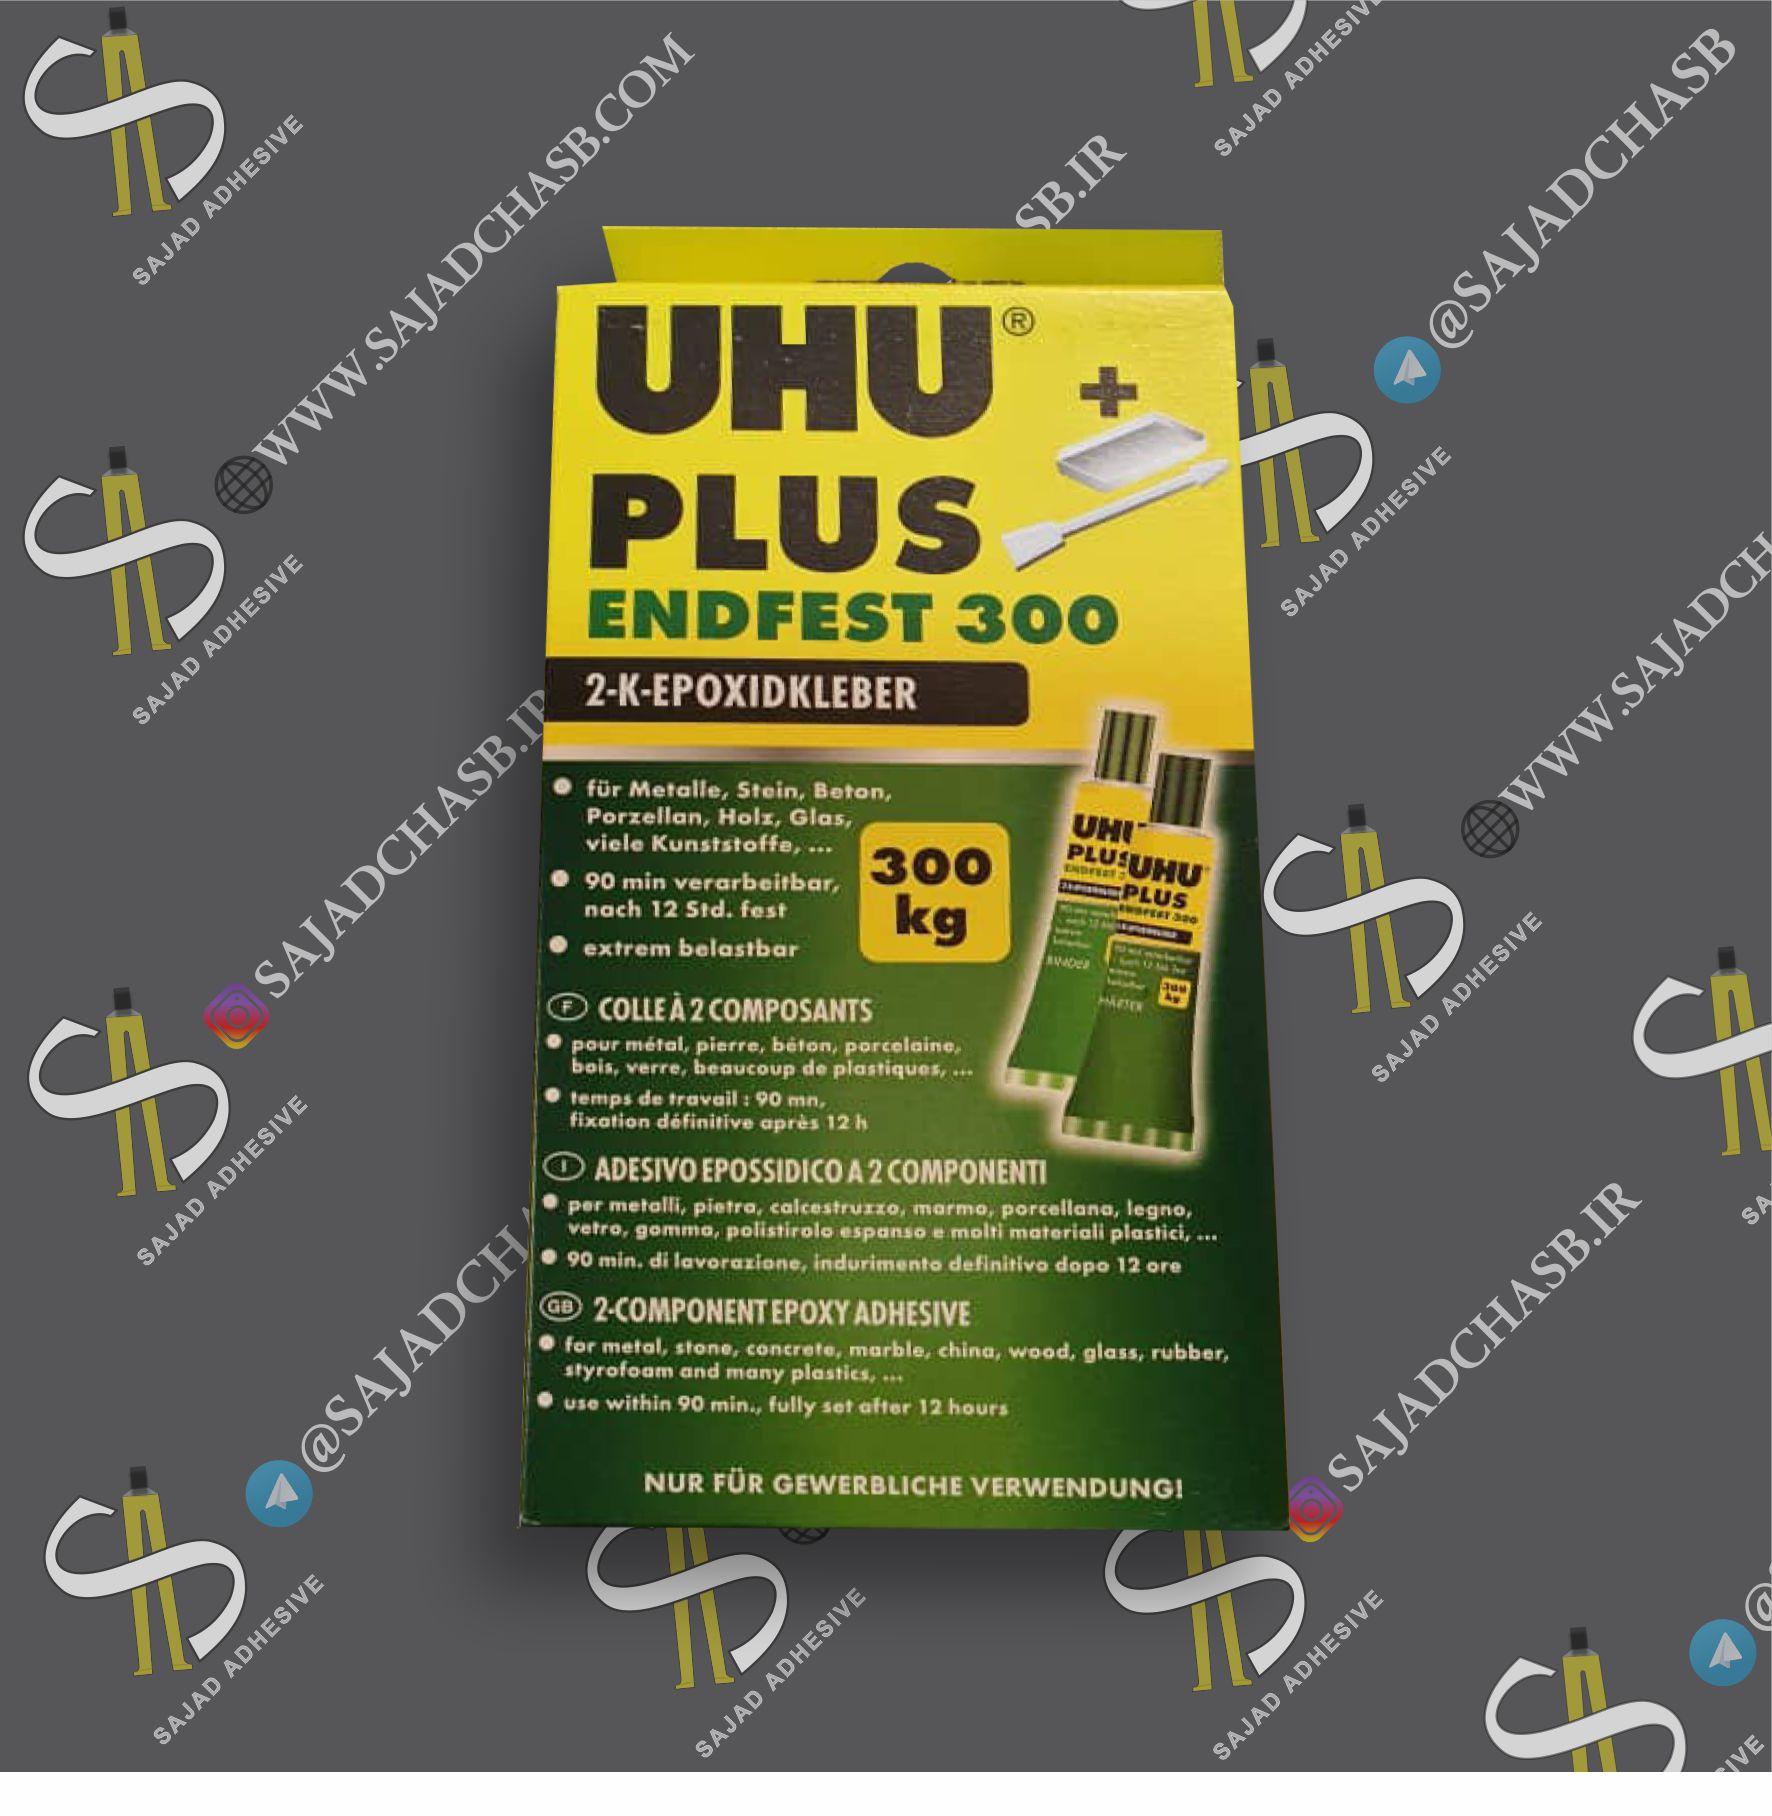 چسب دوقلوی صنعتی اوهو ۱۶۳ گرمی UHU_PLUS_ENDFEST300